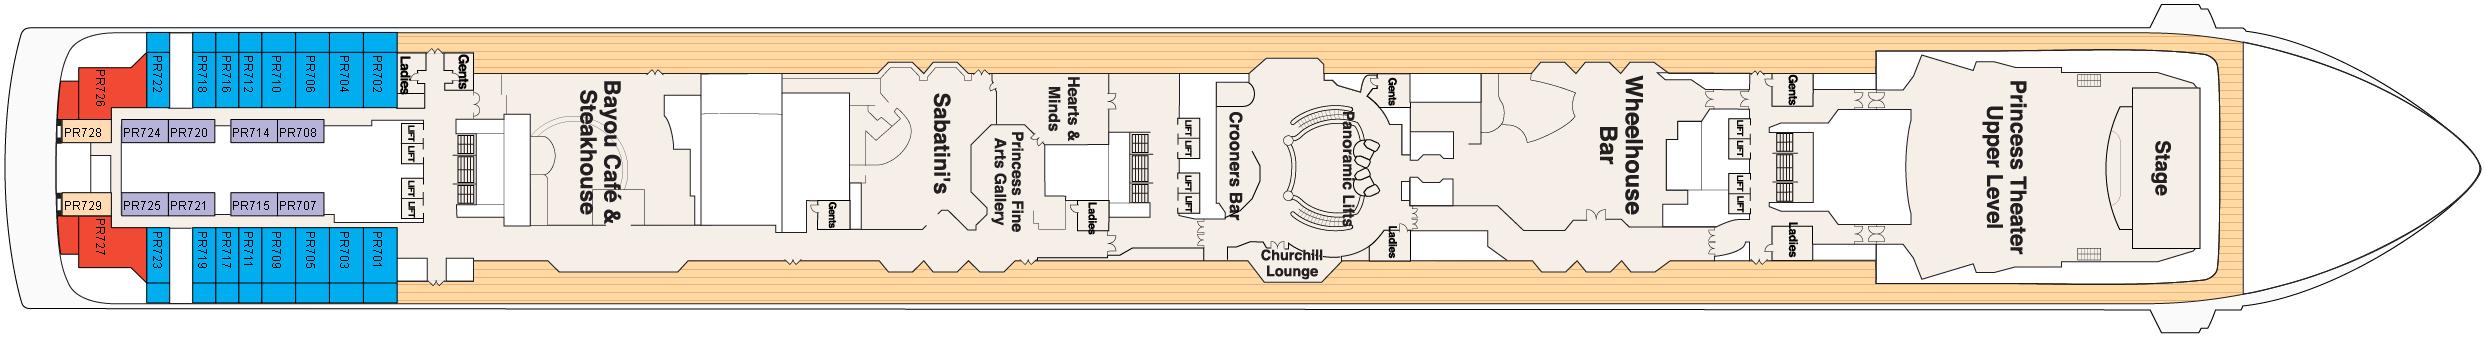 Deck 7 – Promenade